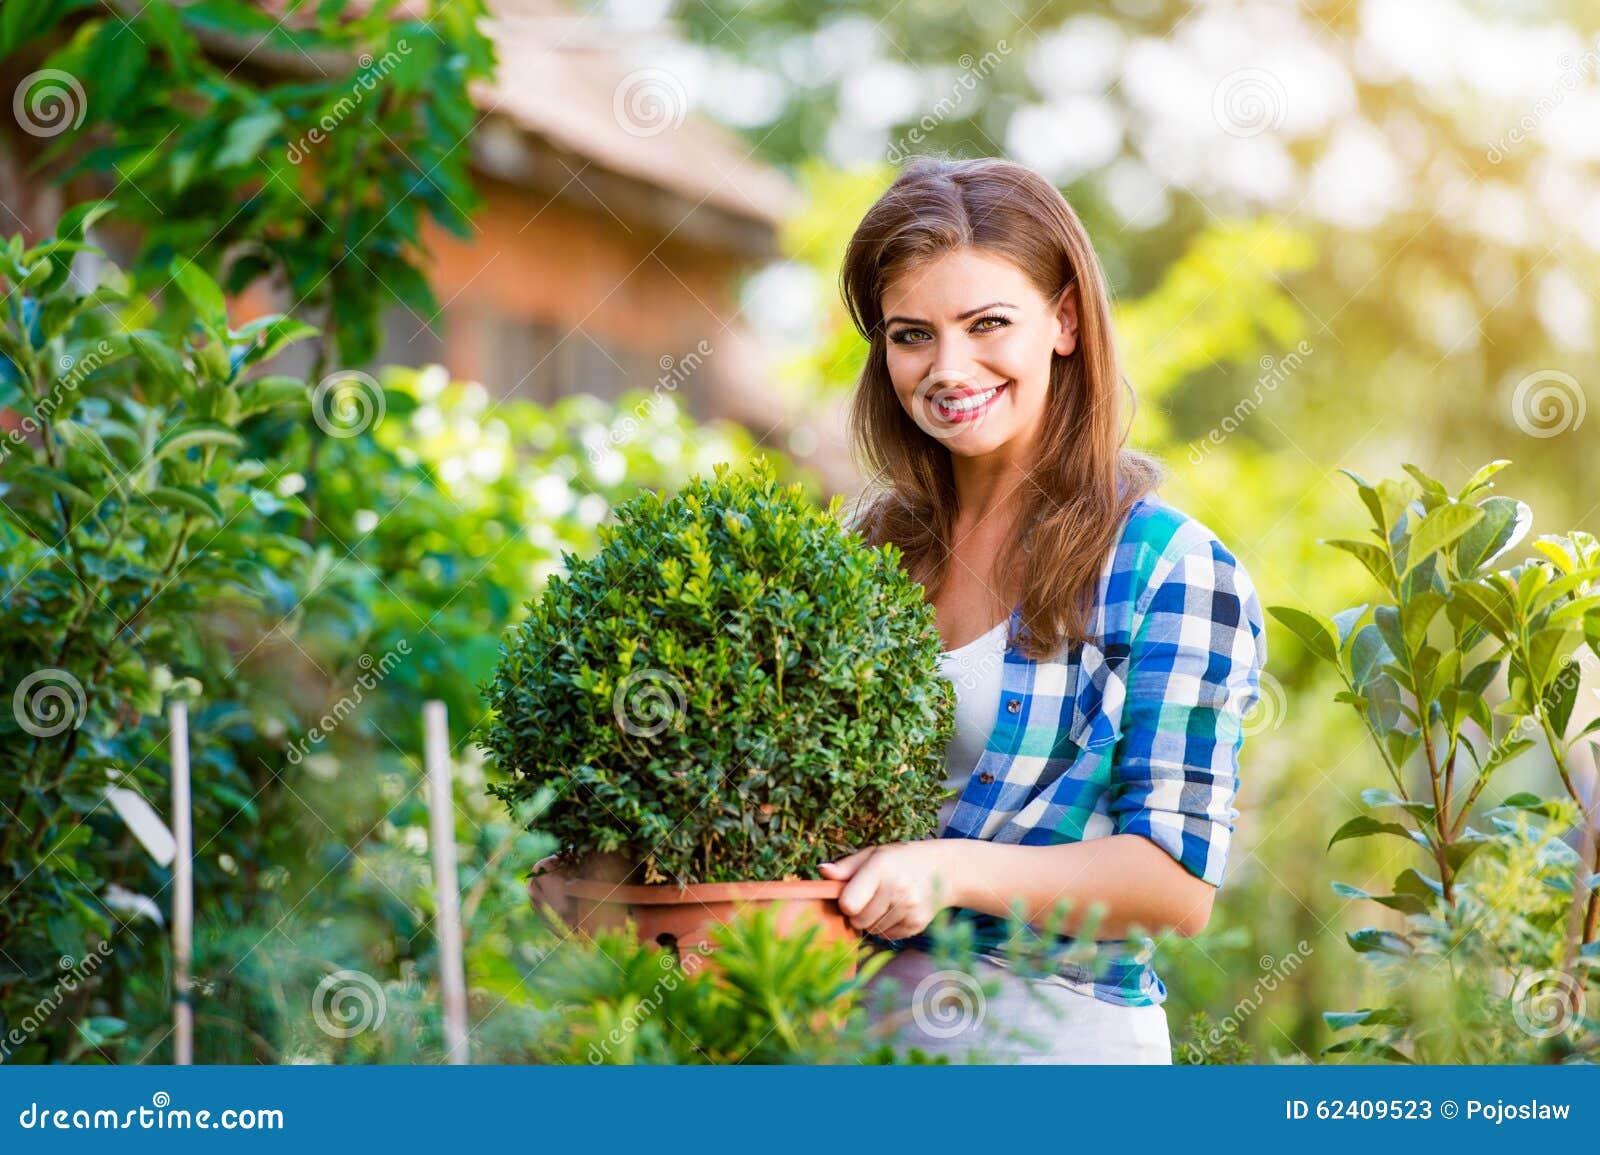 Beautiful Young Woman Gardening Stock Photo Image 62409523